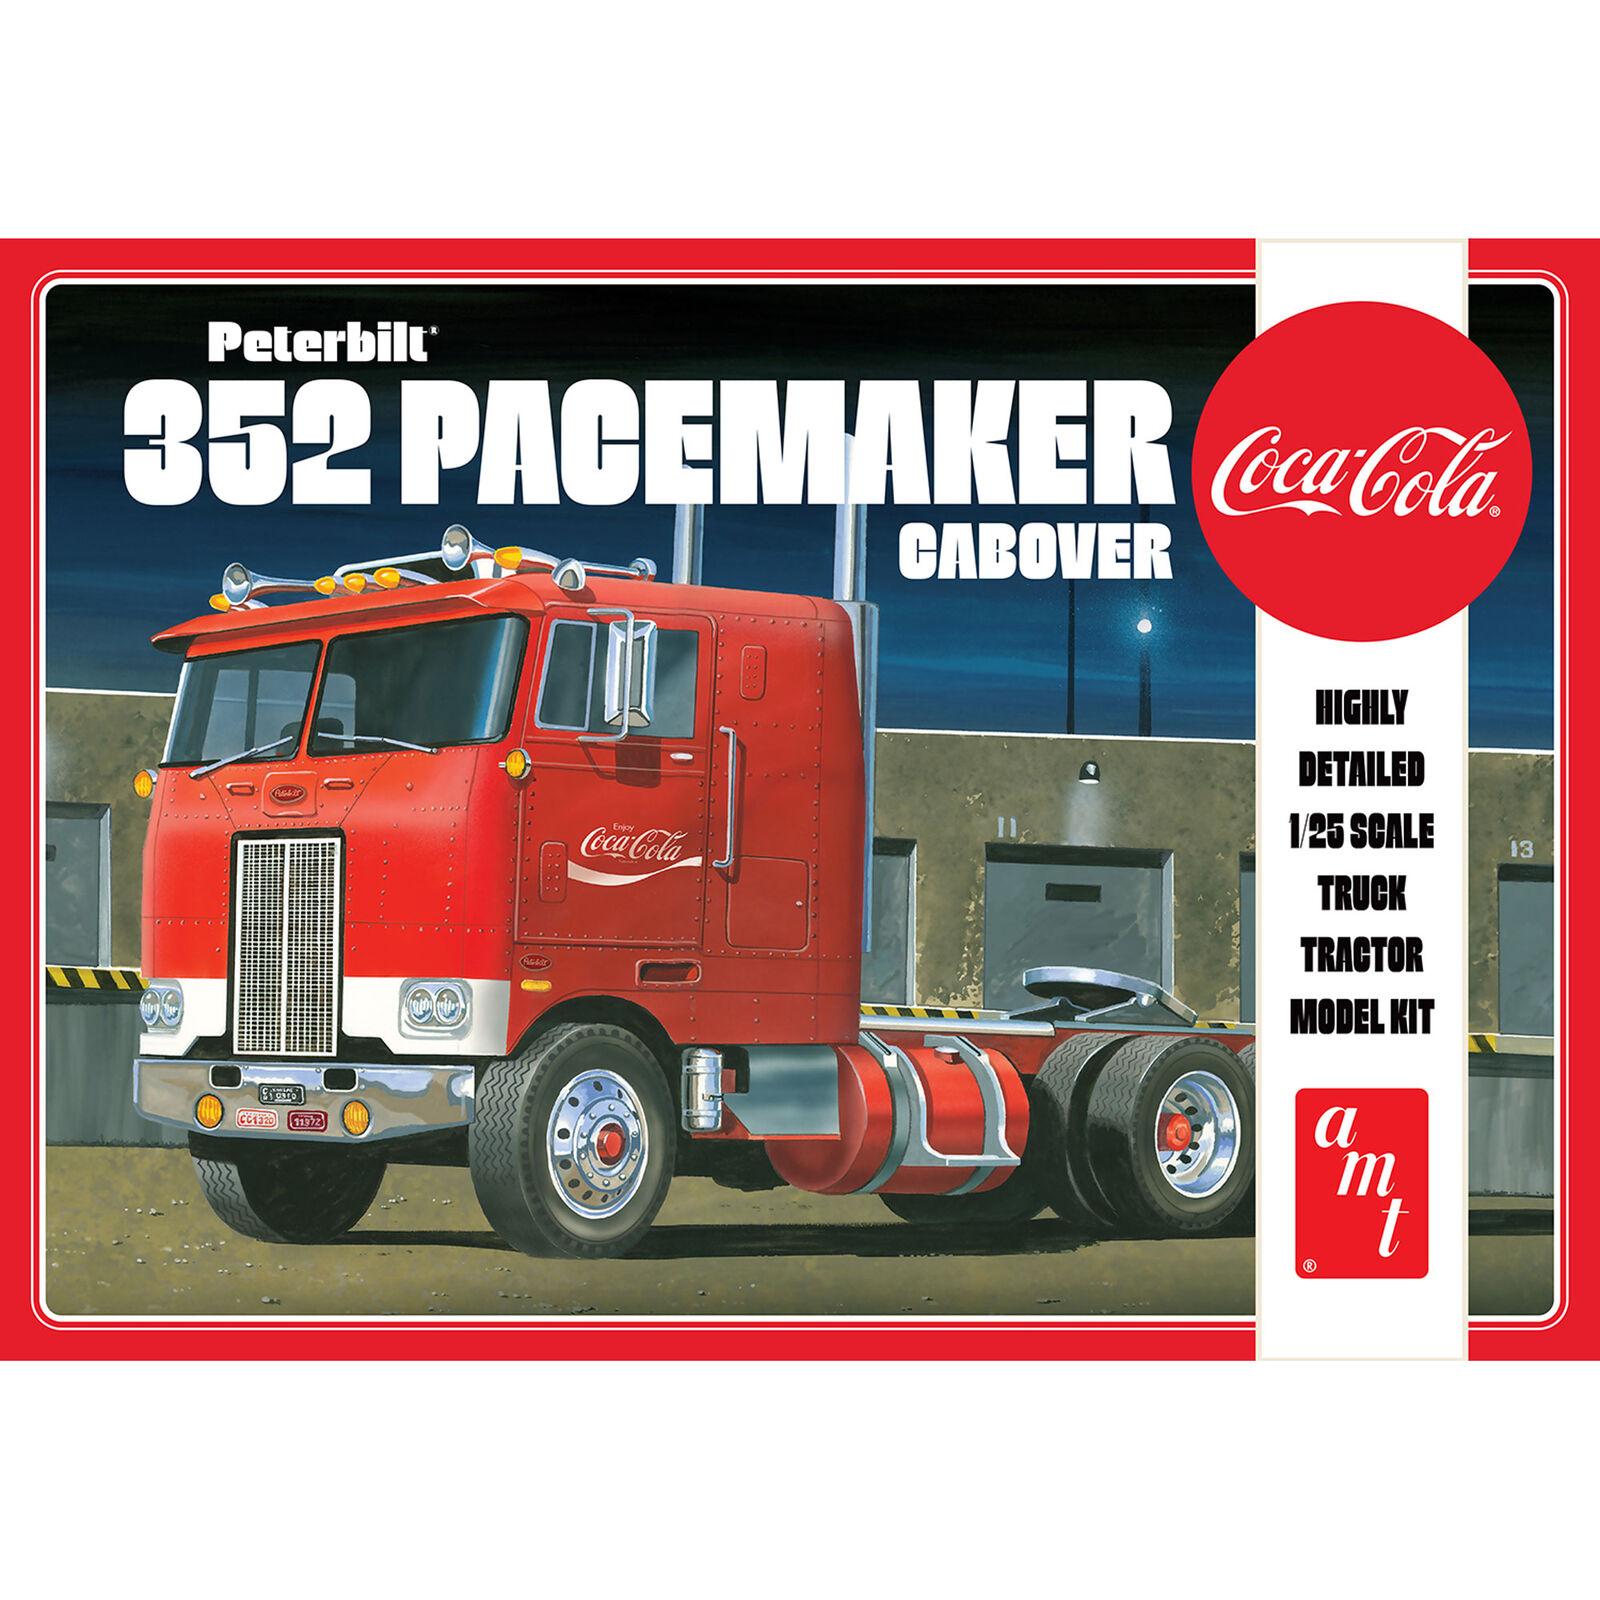 1/25, Peterbilt 352 Pacemaker Cabover, Model Kit